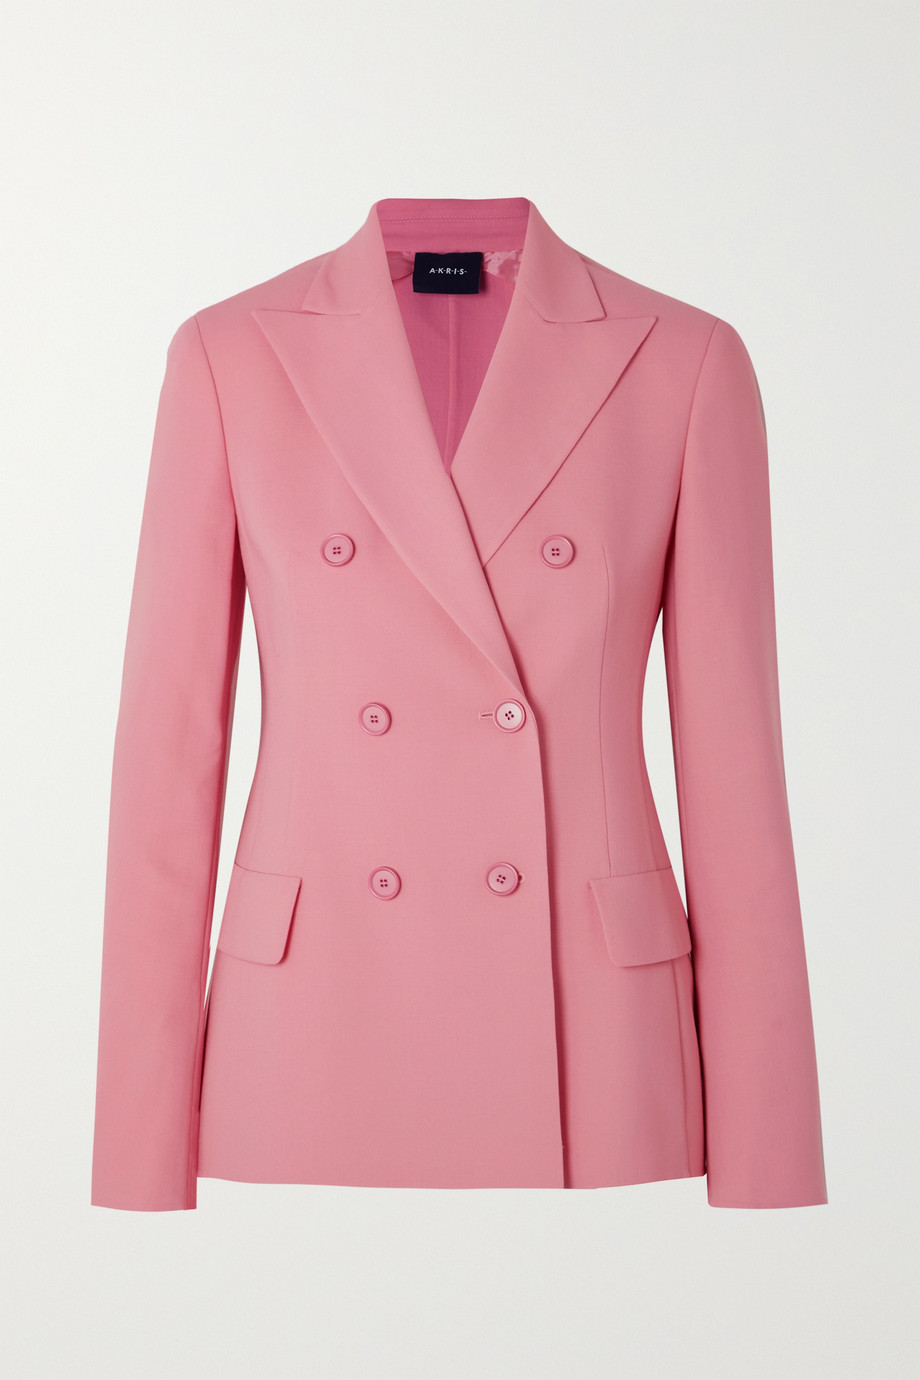 Akris Genaro double-breasted wool-blend blazer